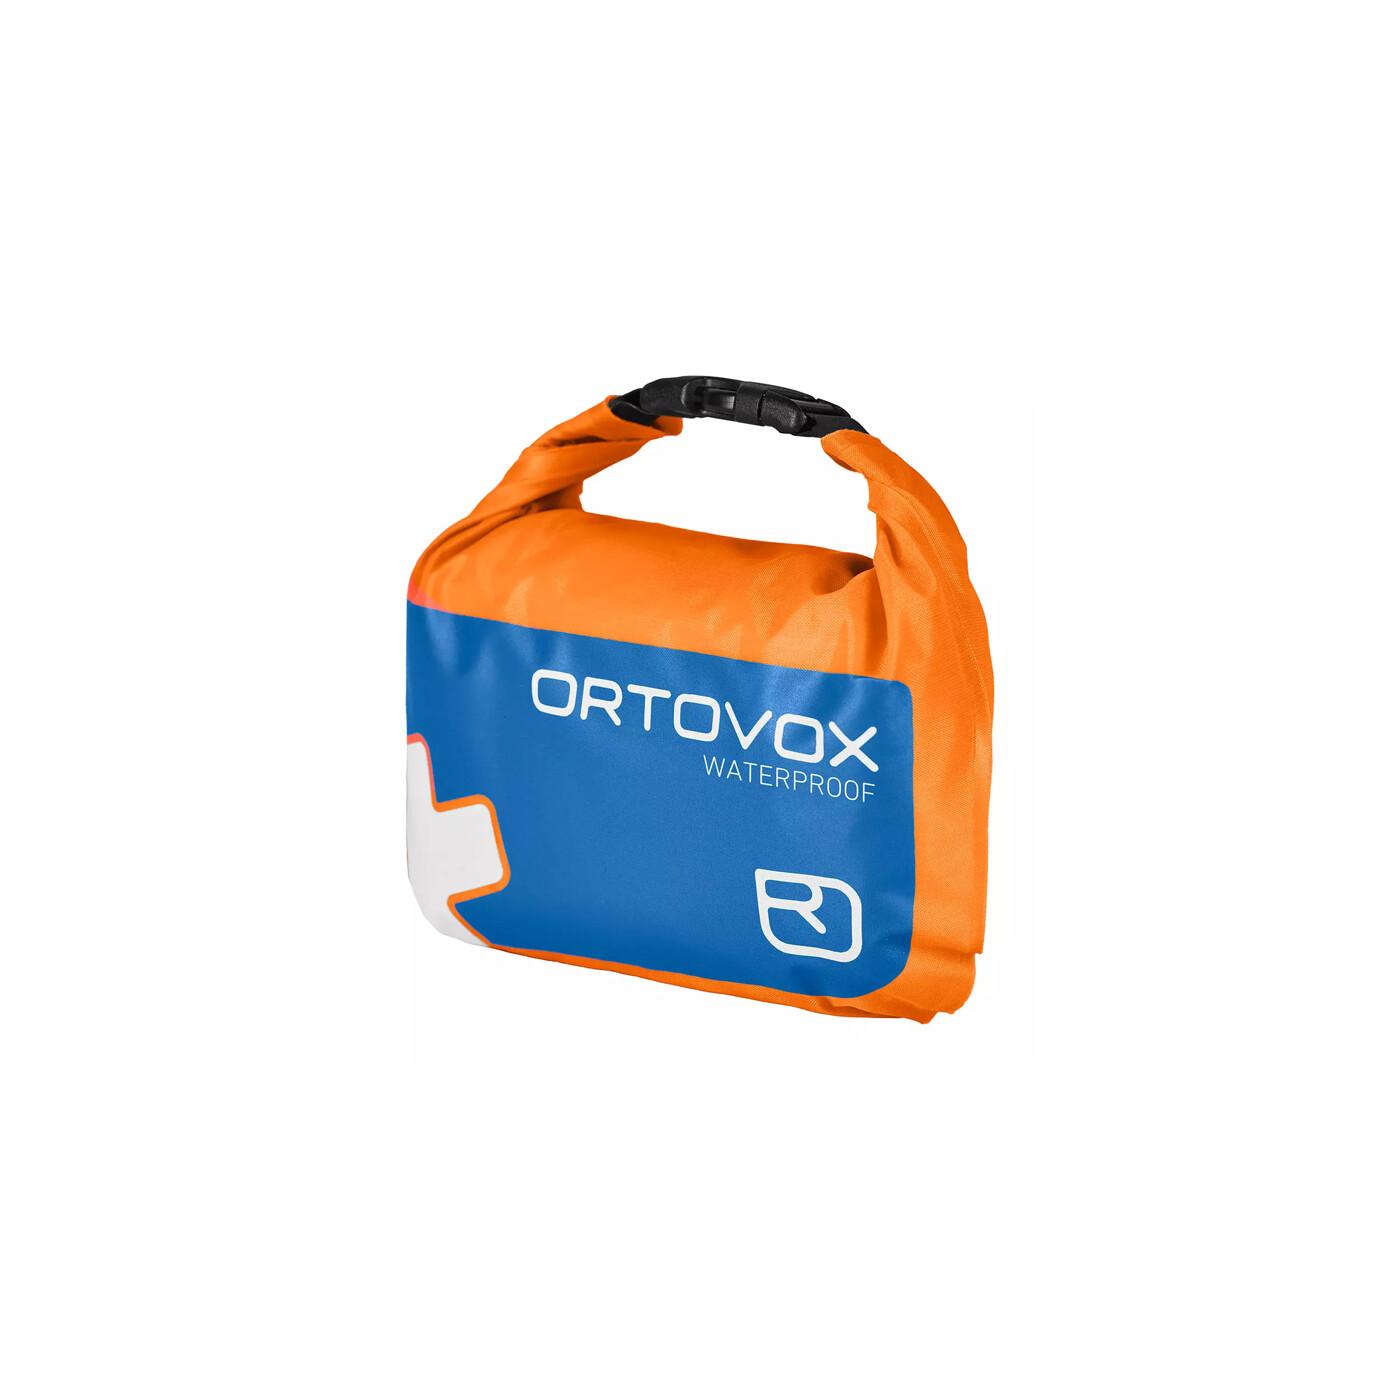 ORTOVOX FIRST AID WATERPROOF